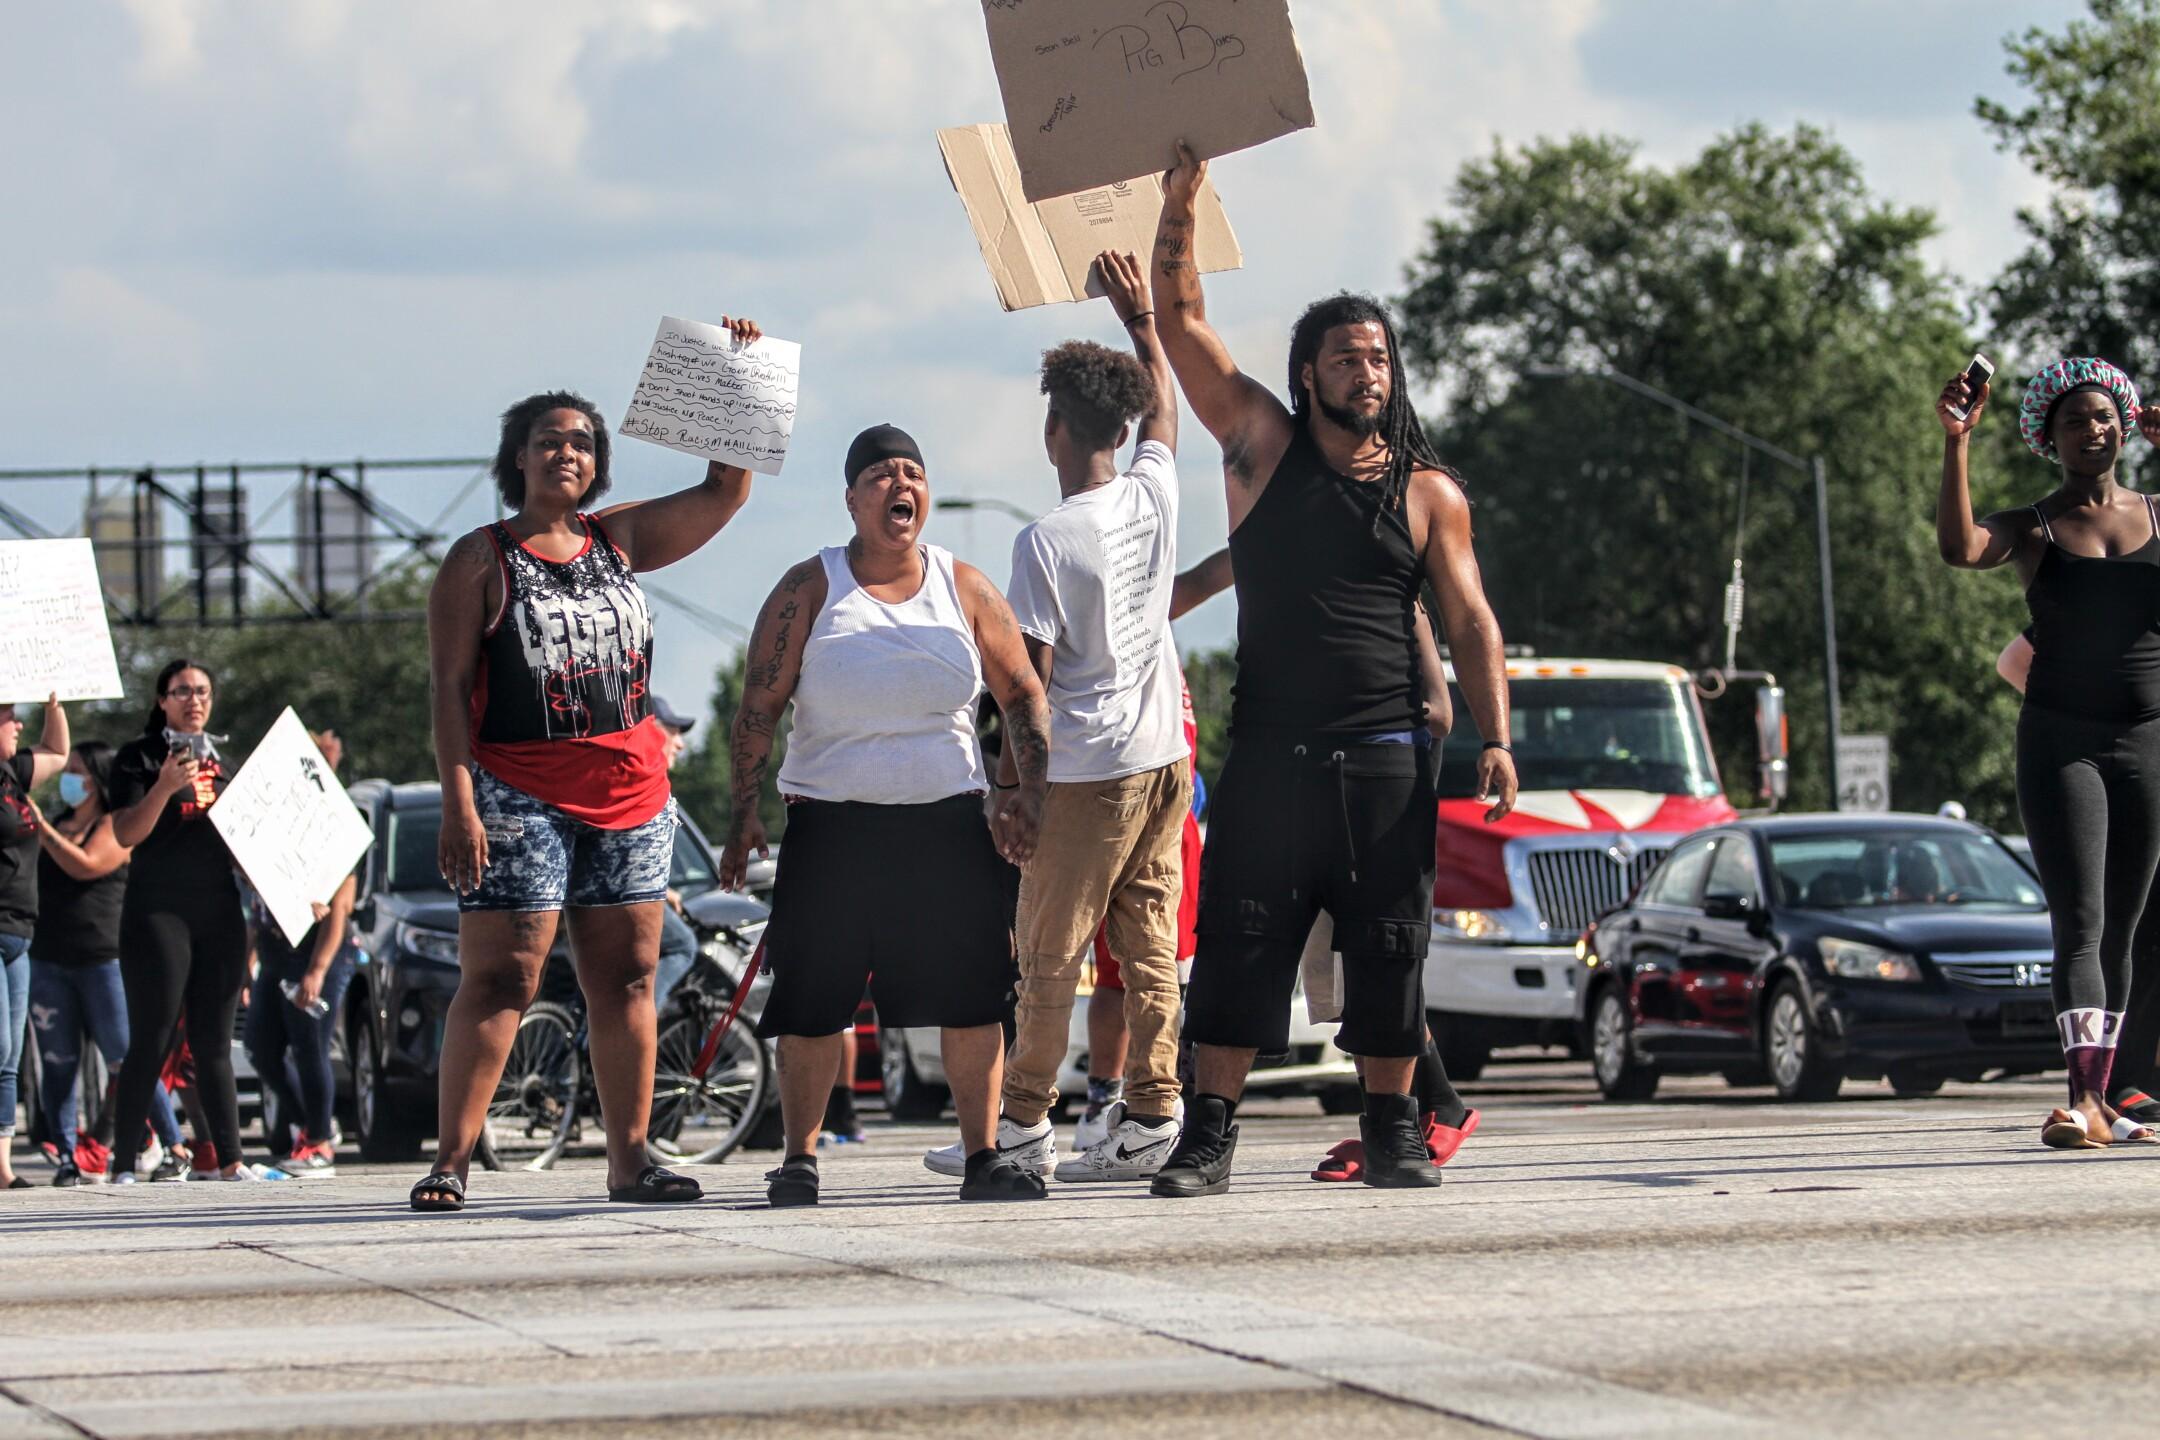 lakeland_protest_IMG_9099 (15).jpg